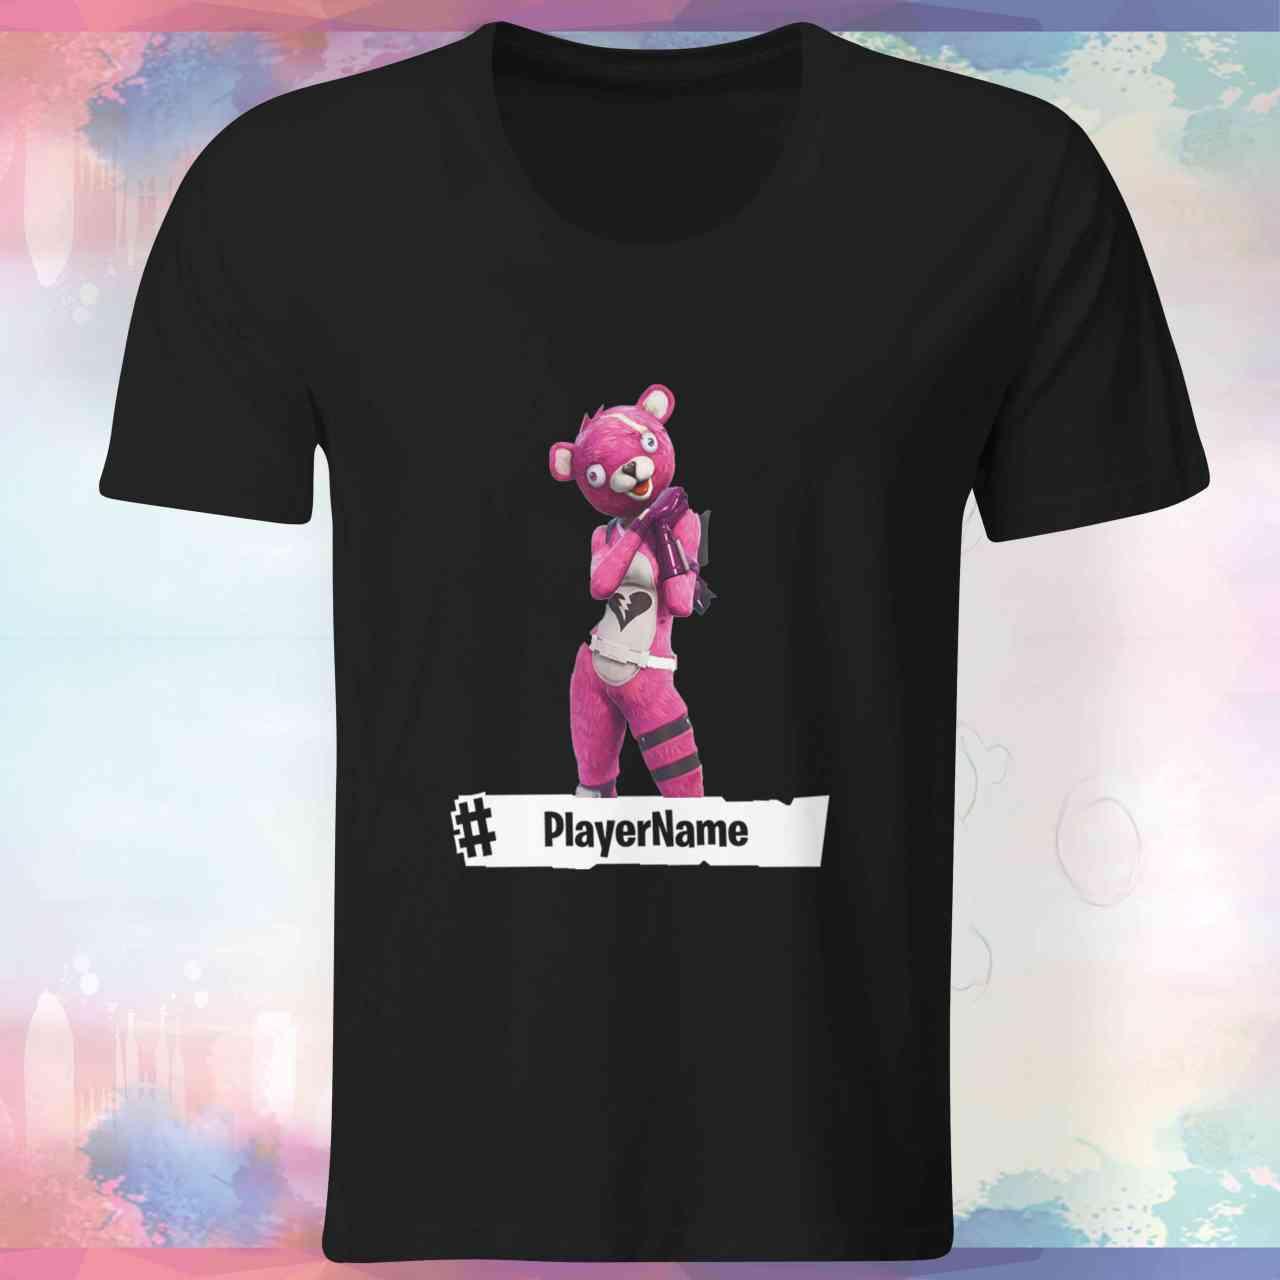 Fortnite | Pink Bear Shirt | mit Player-Name | Battle Royal | T-Shirt | E-Sports - Gamer …